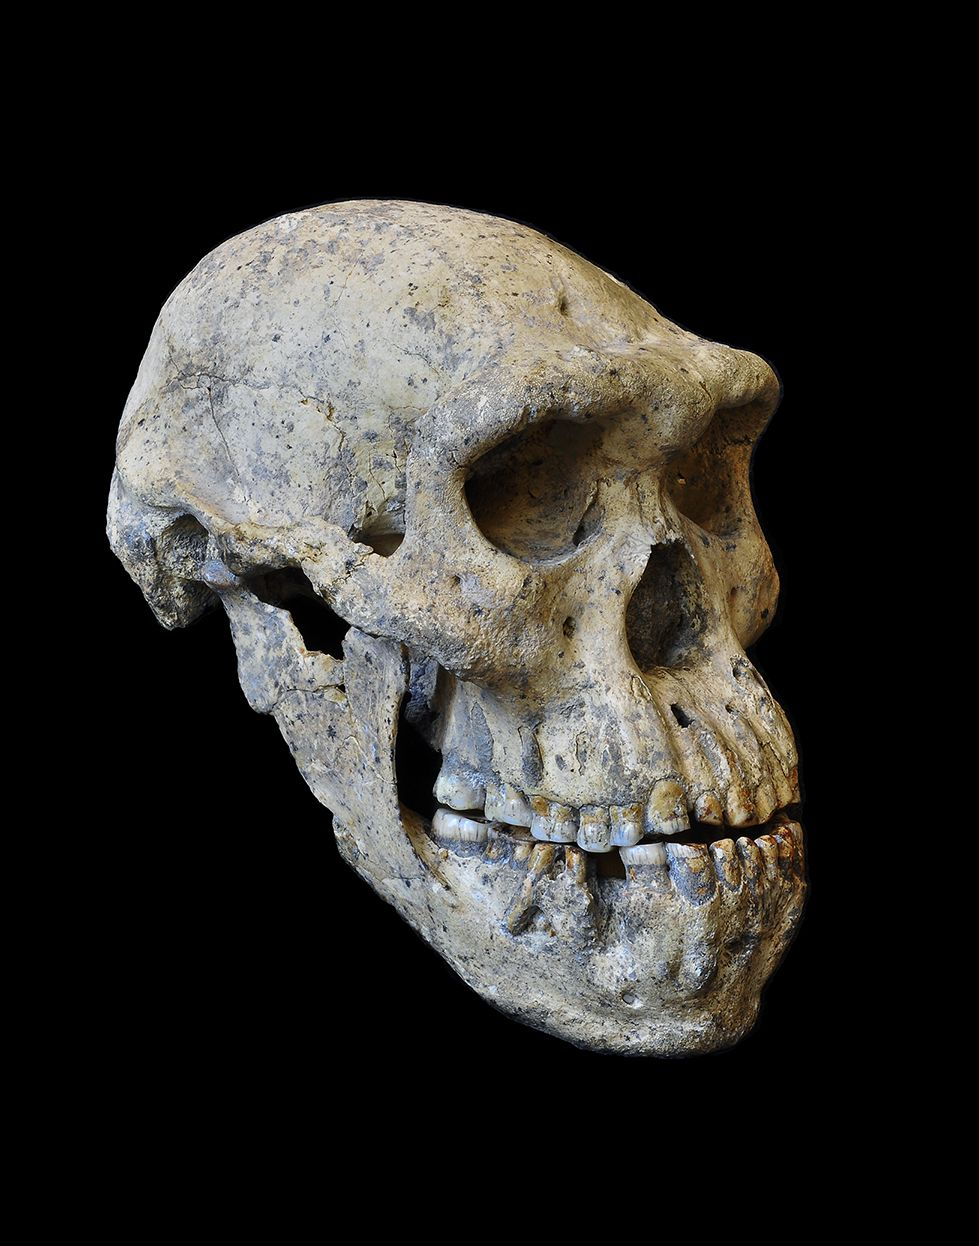 Arbol Genealogico Hominidos Buscar Con Google Human Evolution Ancient Humans Skull